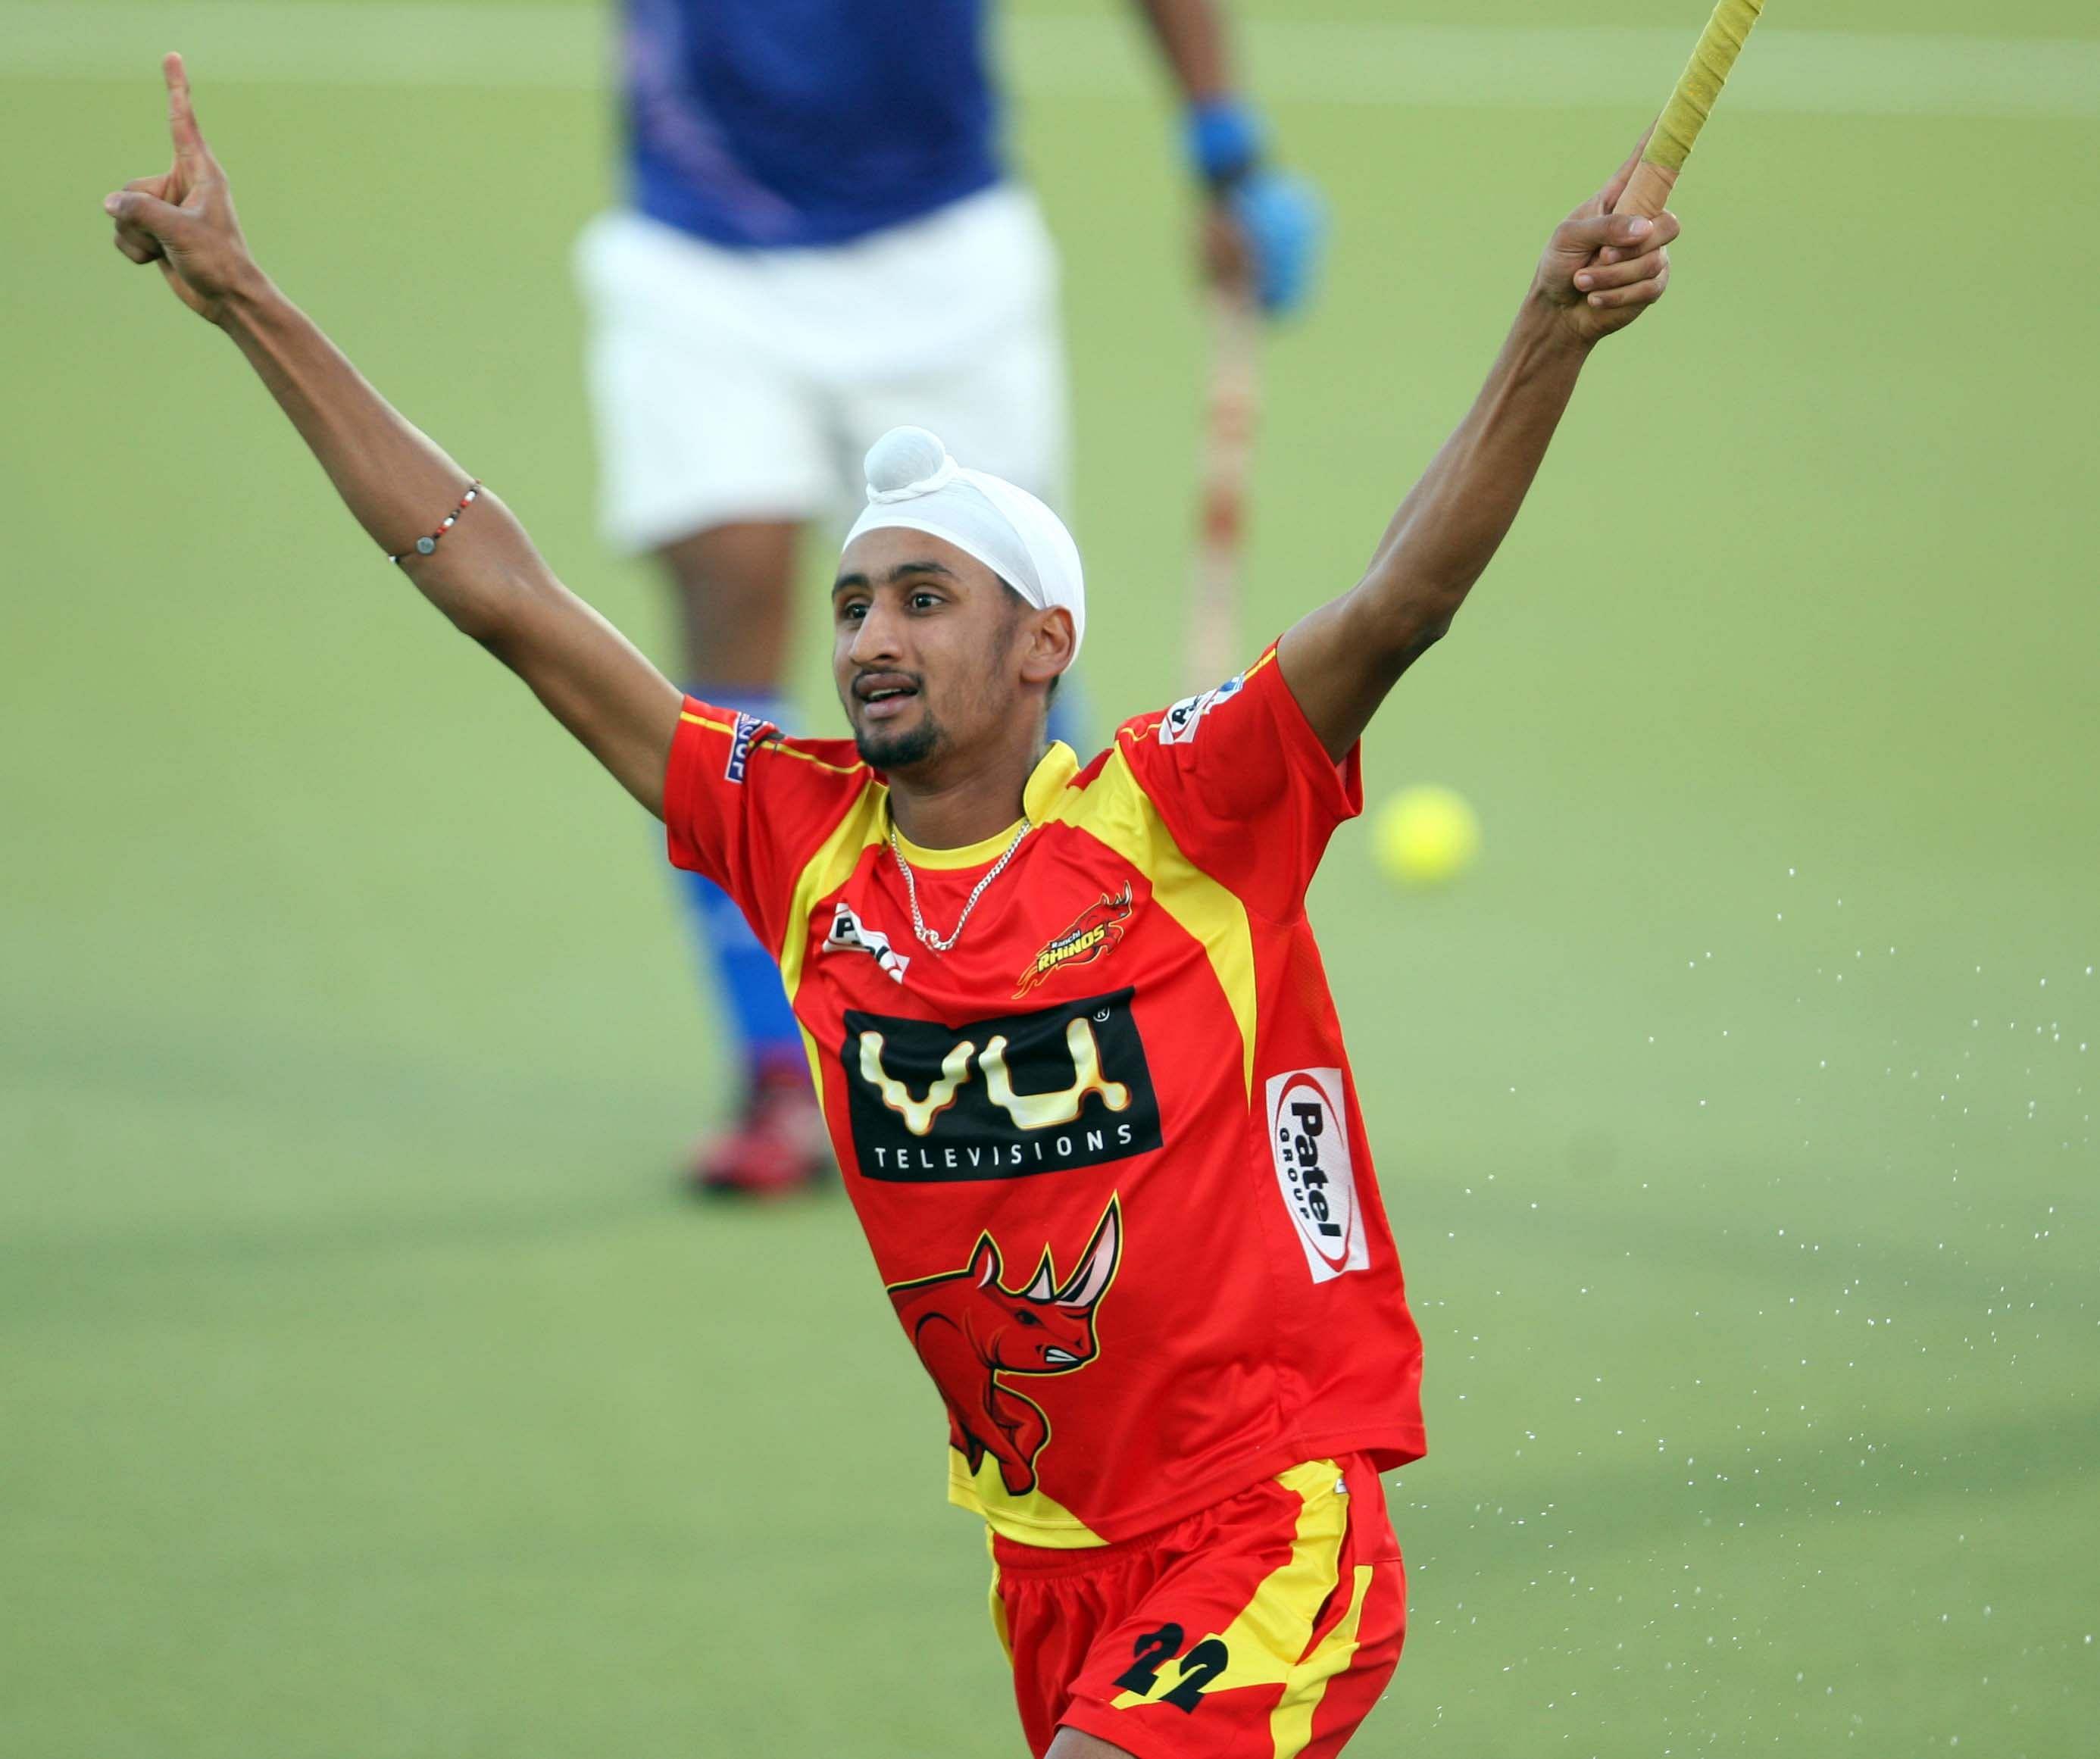 Mandeep Singh (hockey)